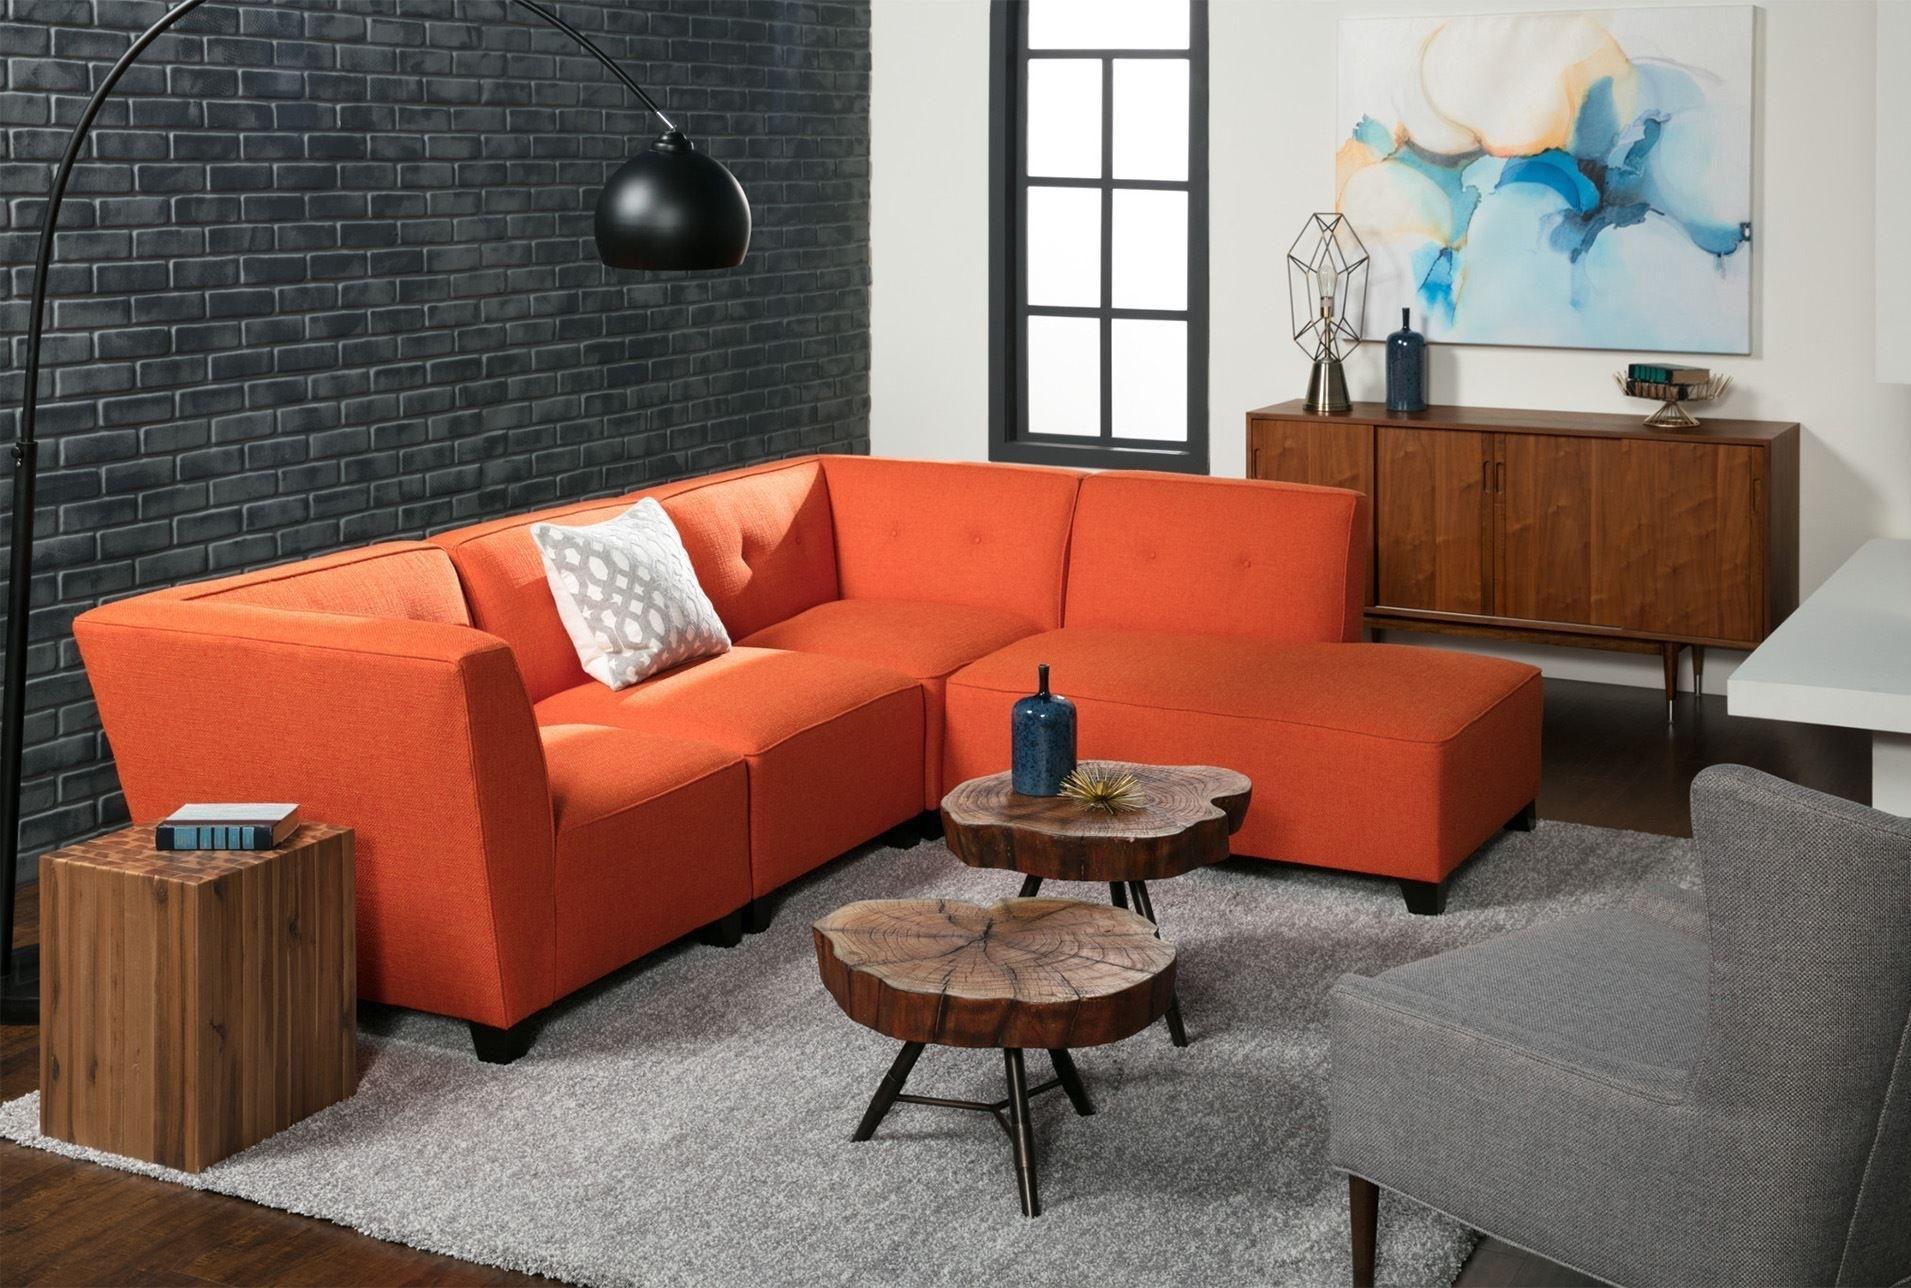 Benton 4 Piece Sectional | Remodel | Pinterest | Sweet House Regarding Benton 4 Piece Sectionals (Image 5 of 25)